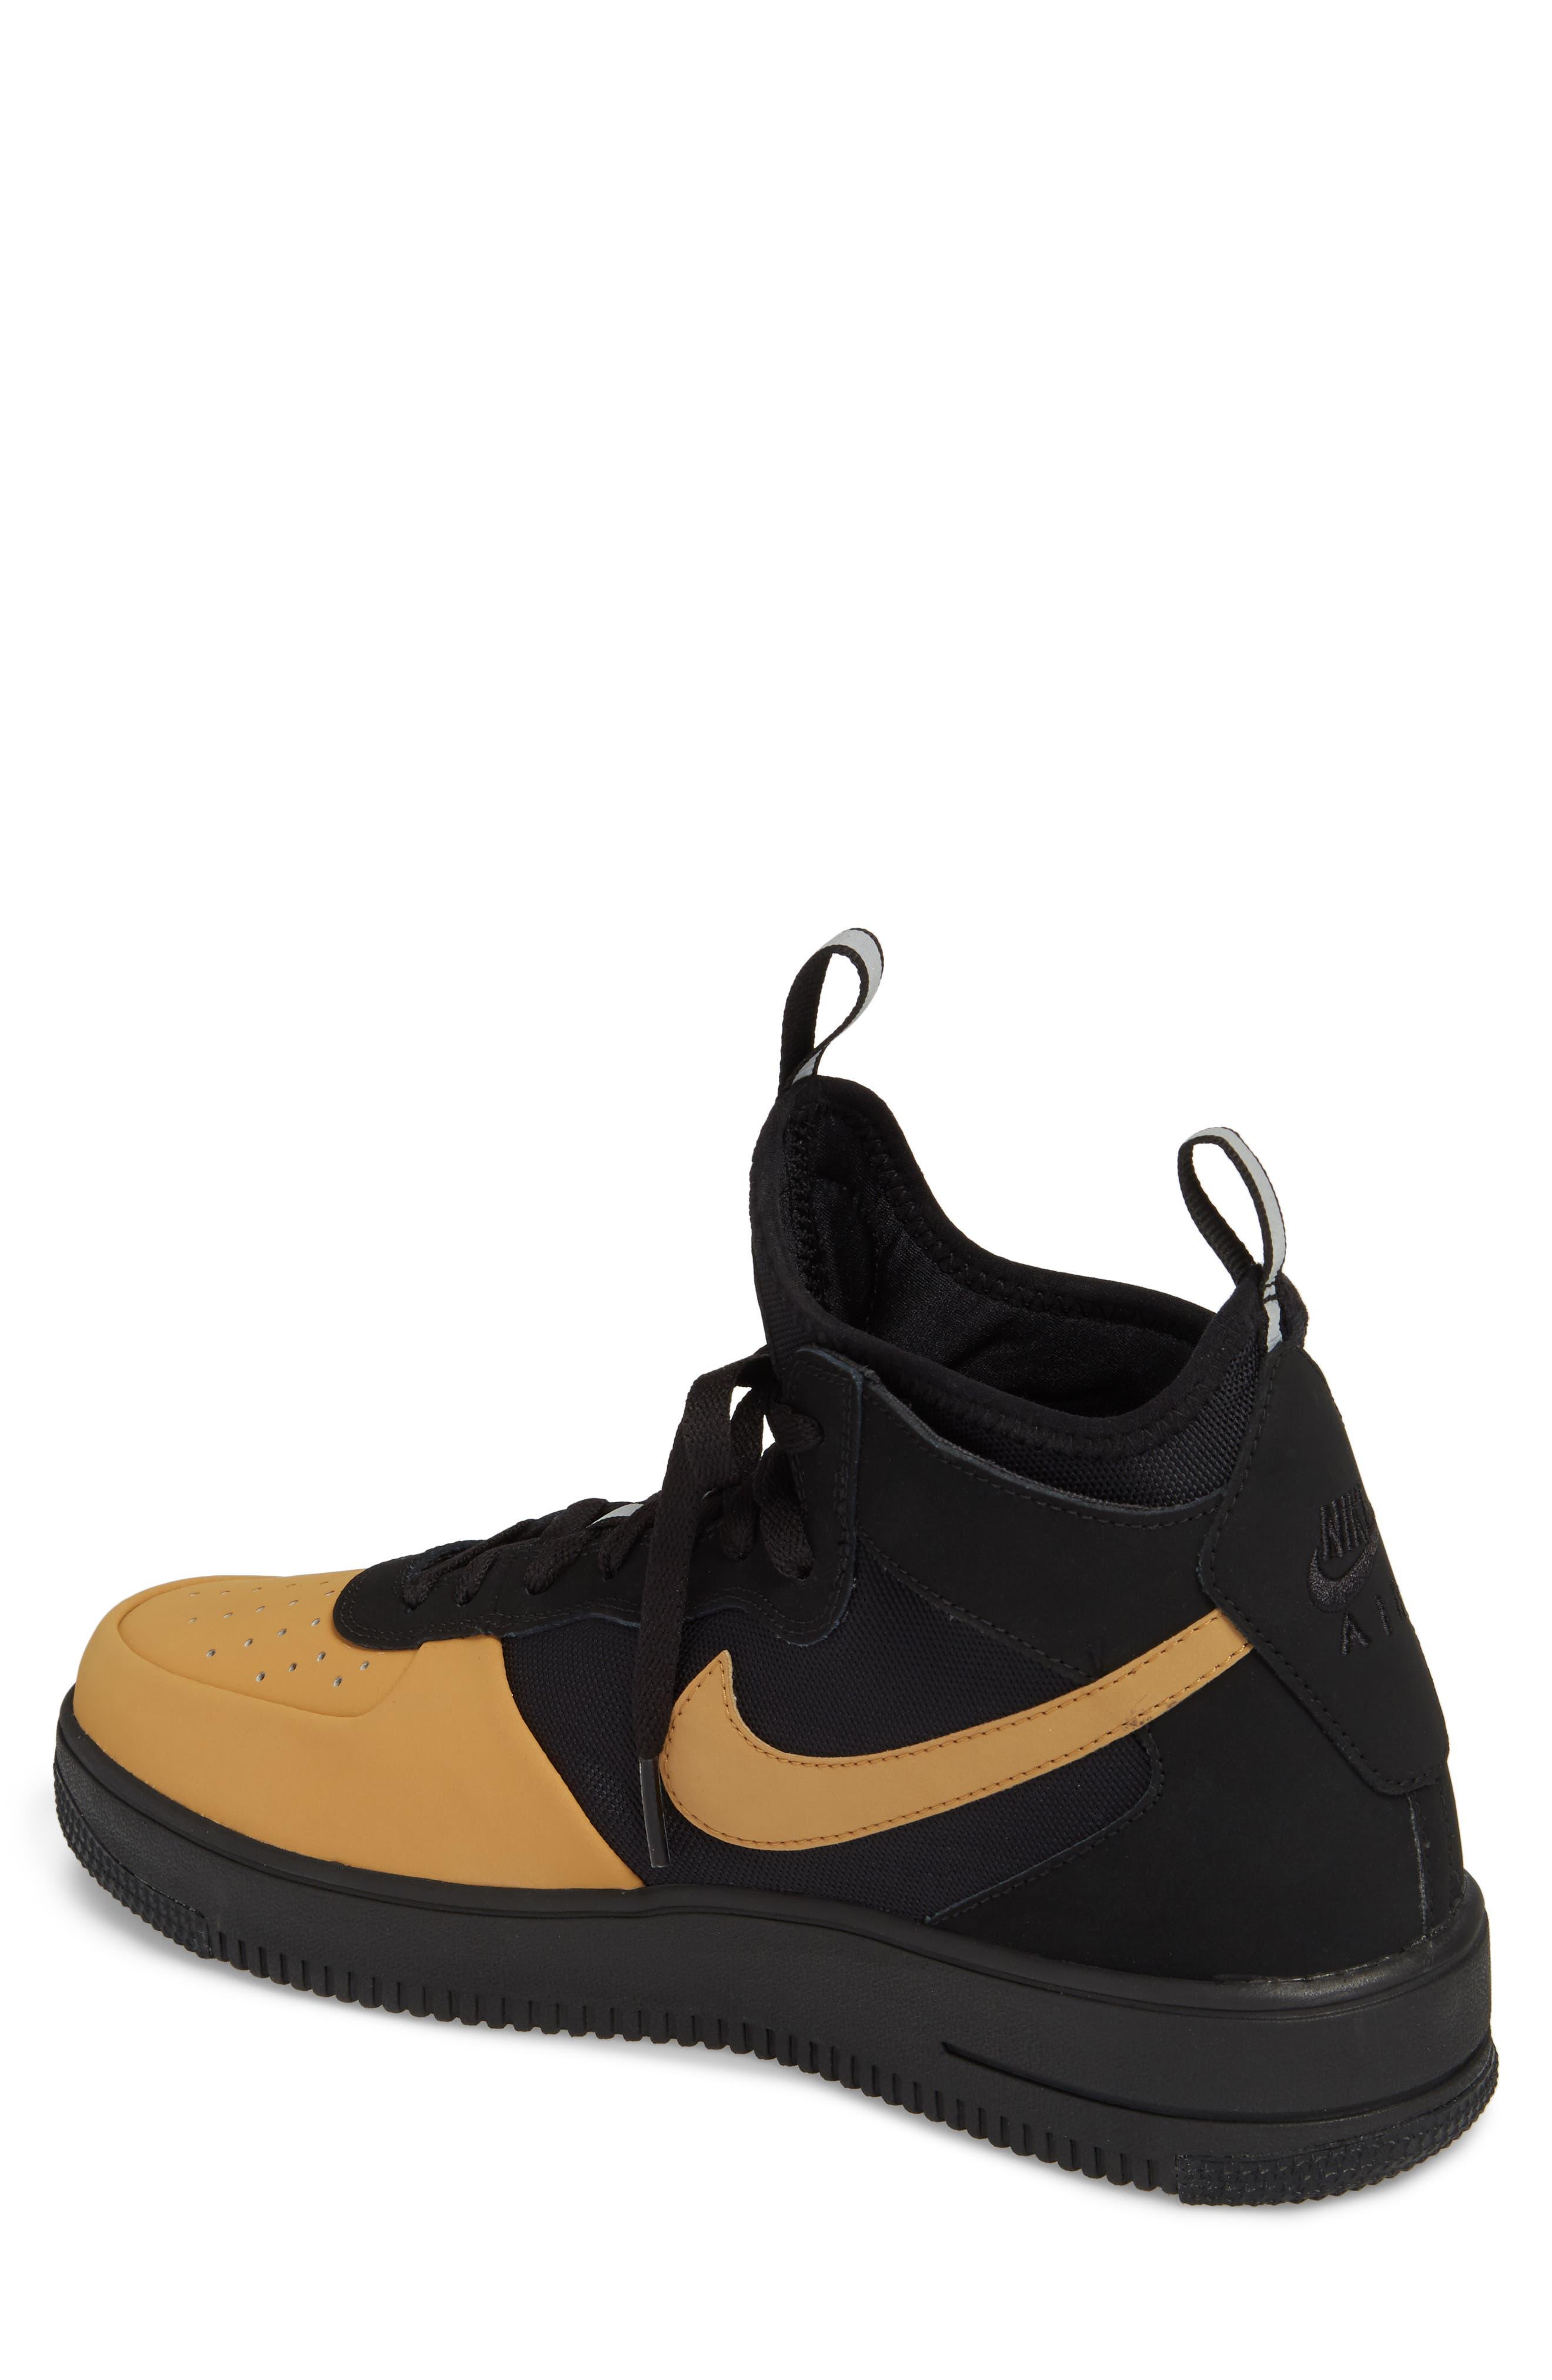 Air Force 1 Ultraforce Mid Tech Sneaker,                             Alternate thumbnail 2, color,                             002